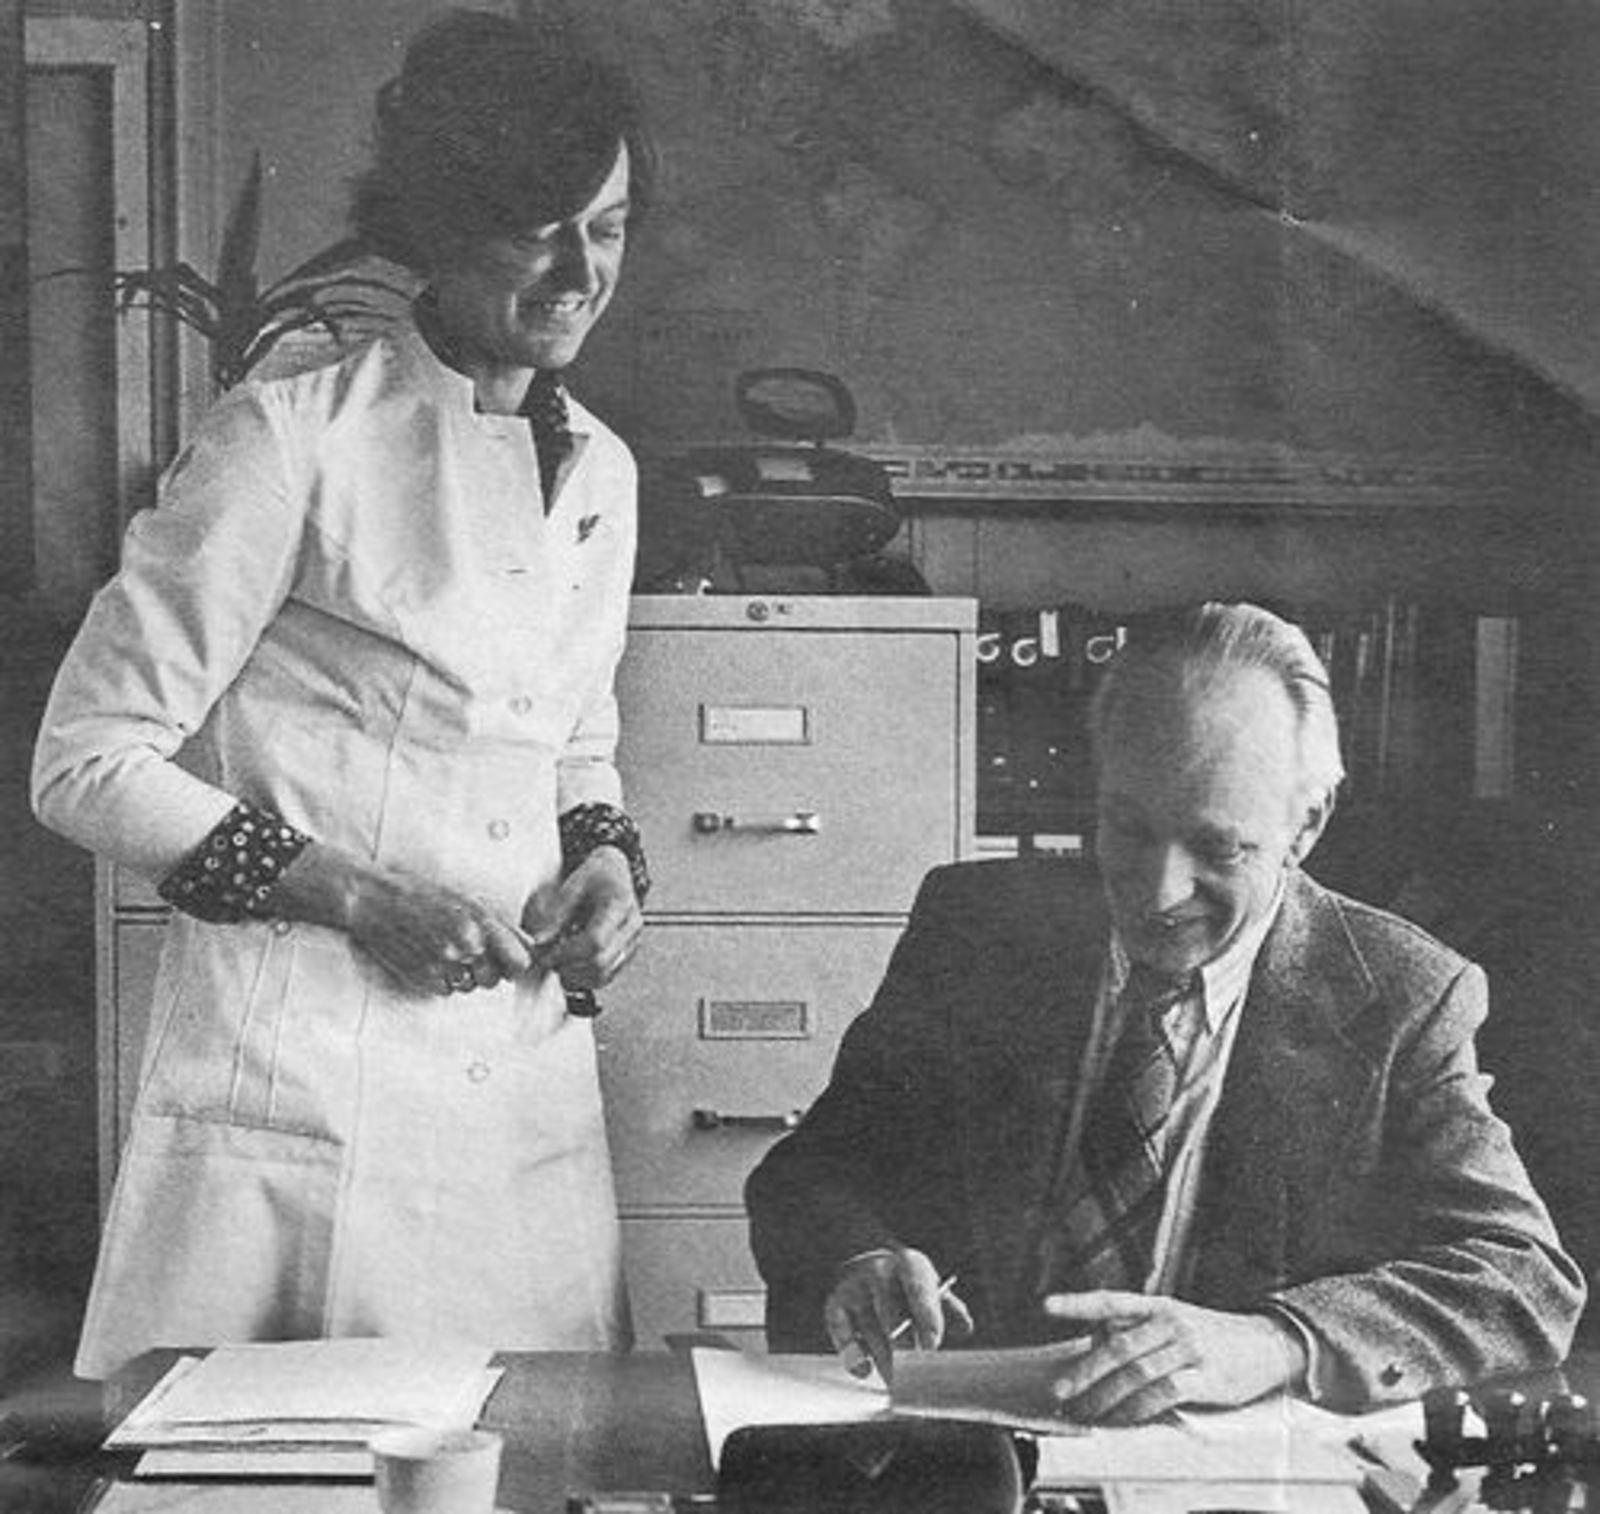 Bult Jan 1976 Bedrijfsarts bij Polygram